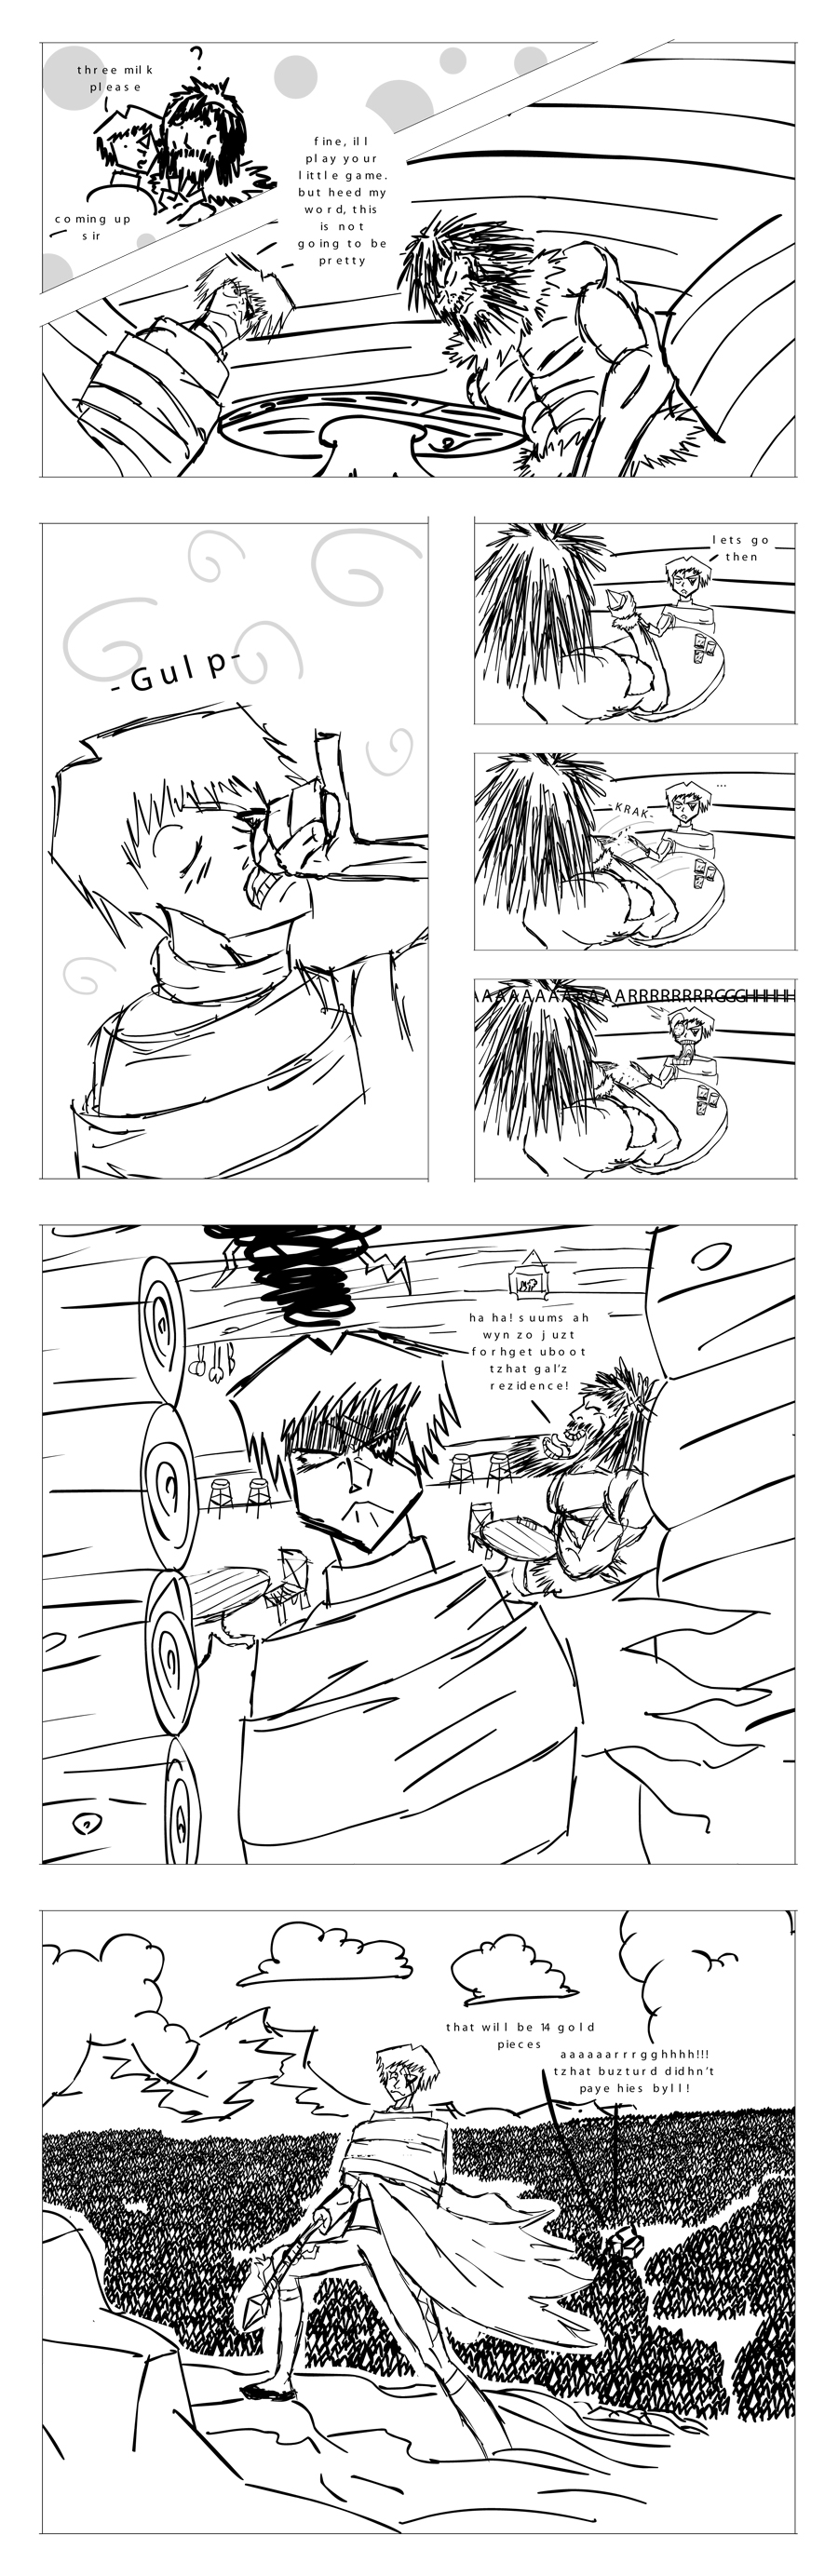 The Matadorion: return 02, 2 by Otamie